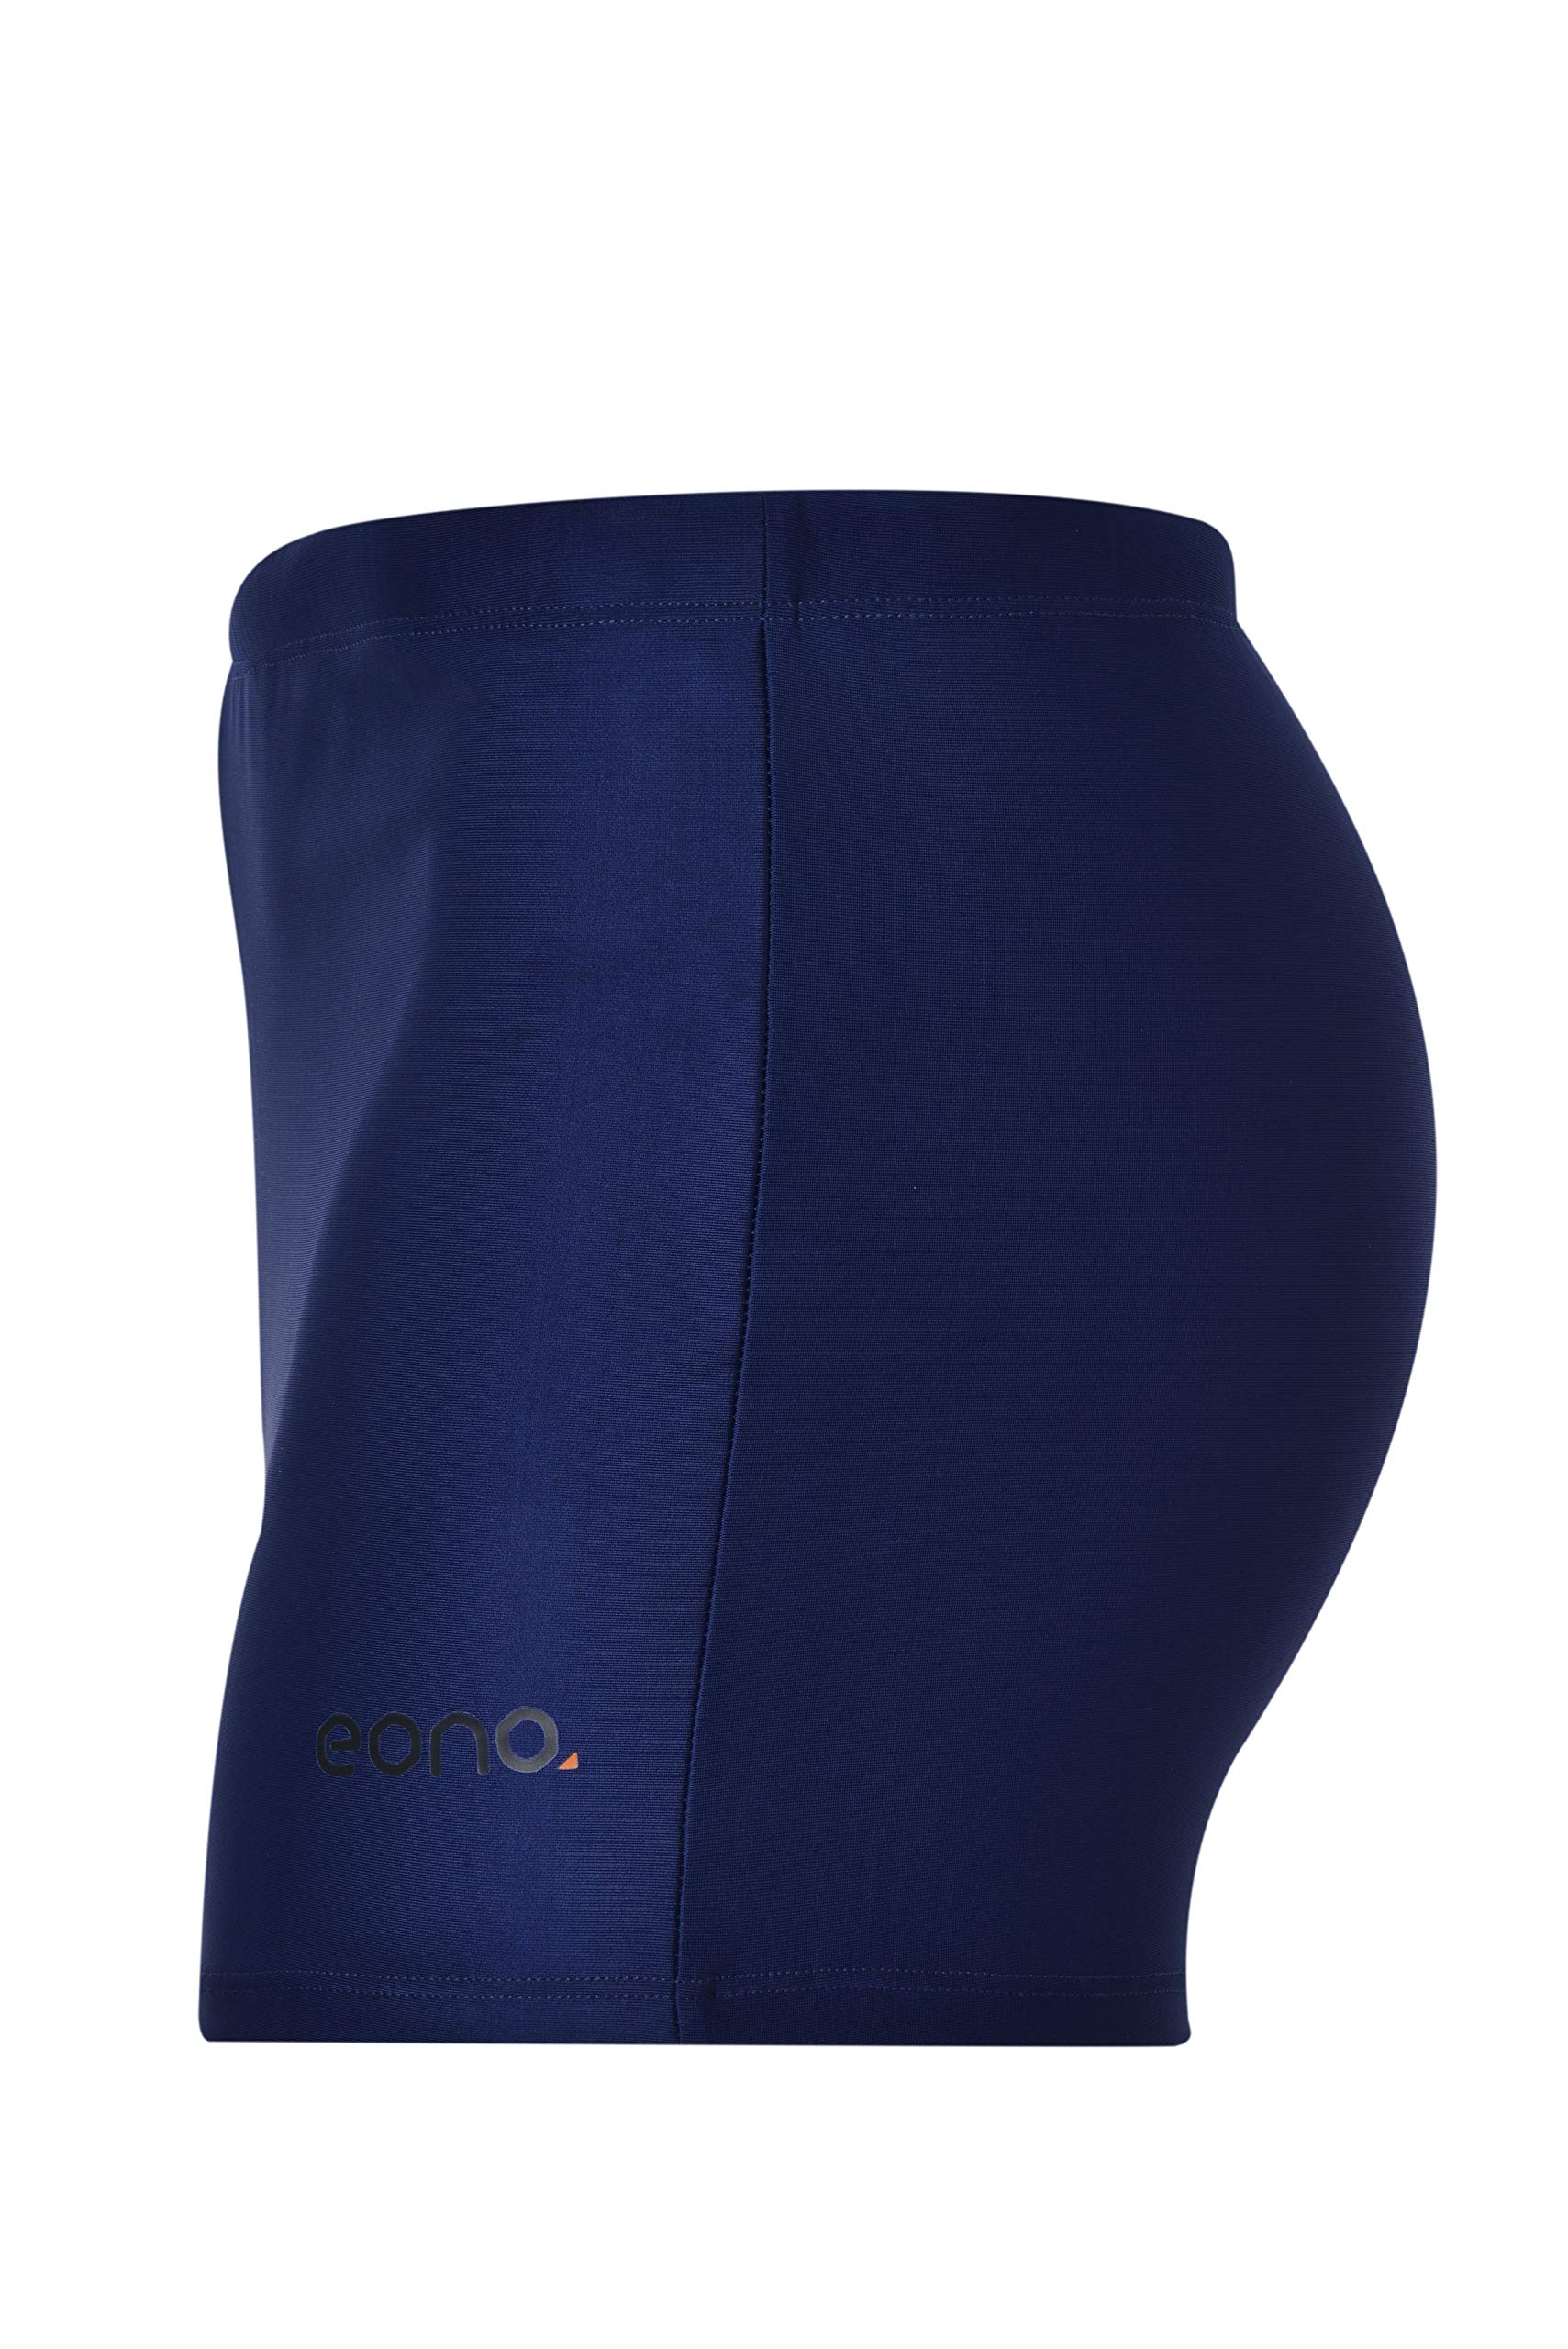 Eono Essentials pantaloncini uomo